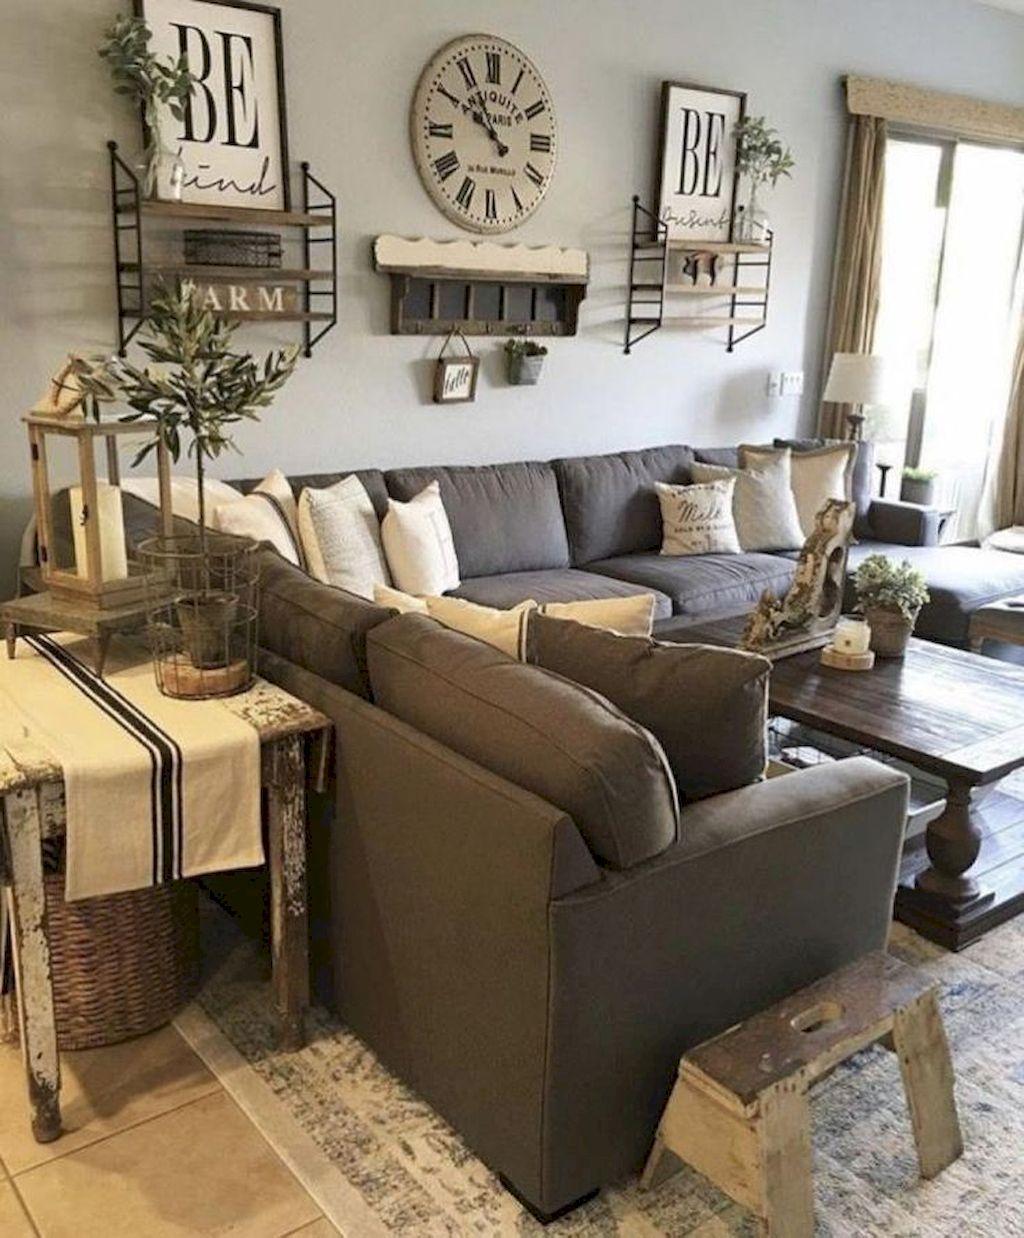 80 Cozy Shabby Chic Living Room Decorating Ideas -   5 shabby chic modern ideas